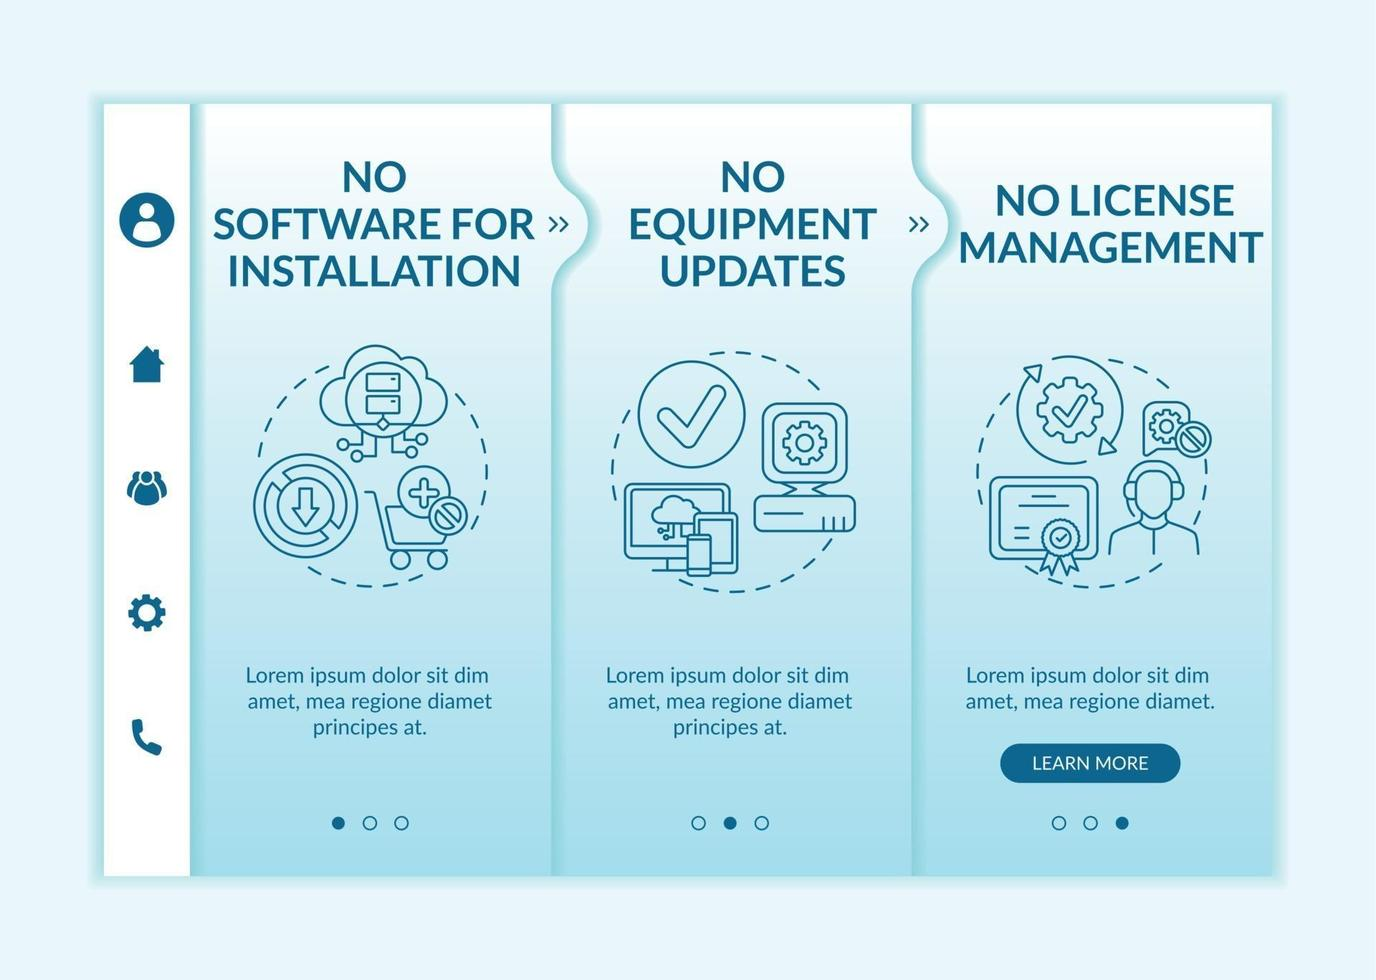 Software als Service Vorteile Onboarding Vektor Vorlage